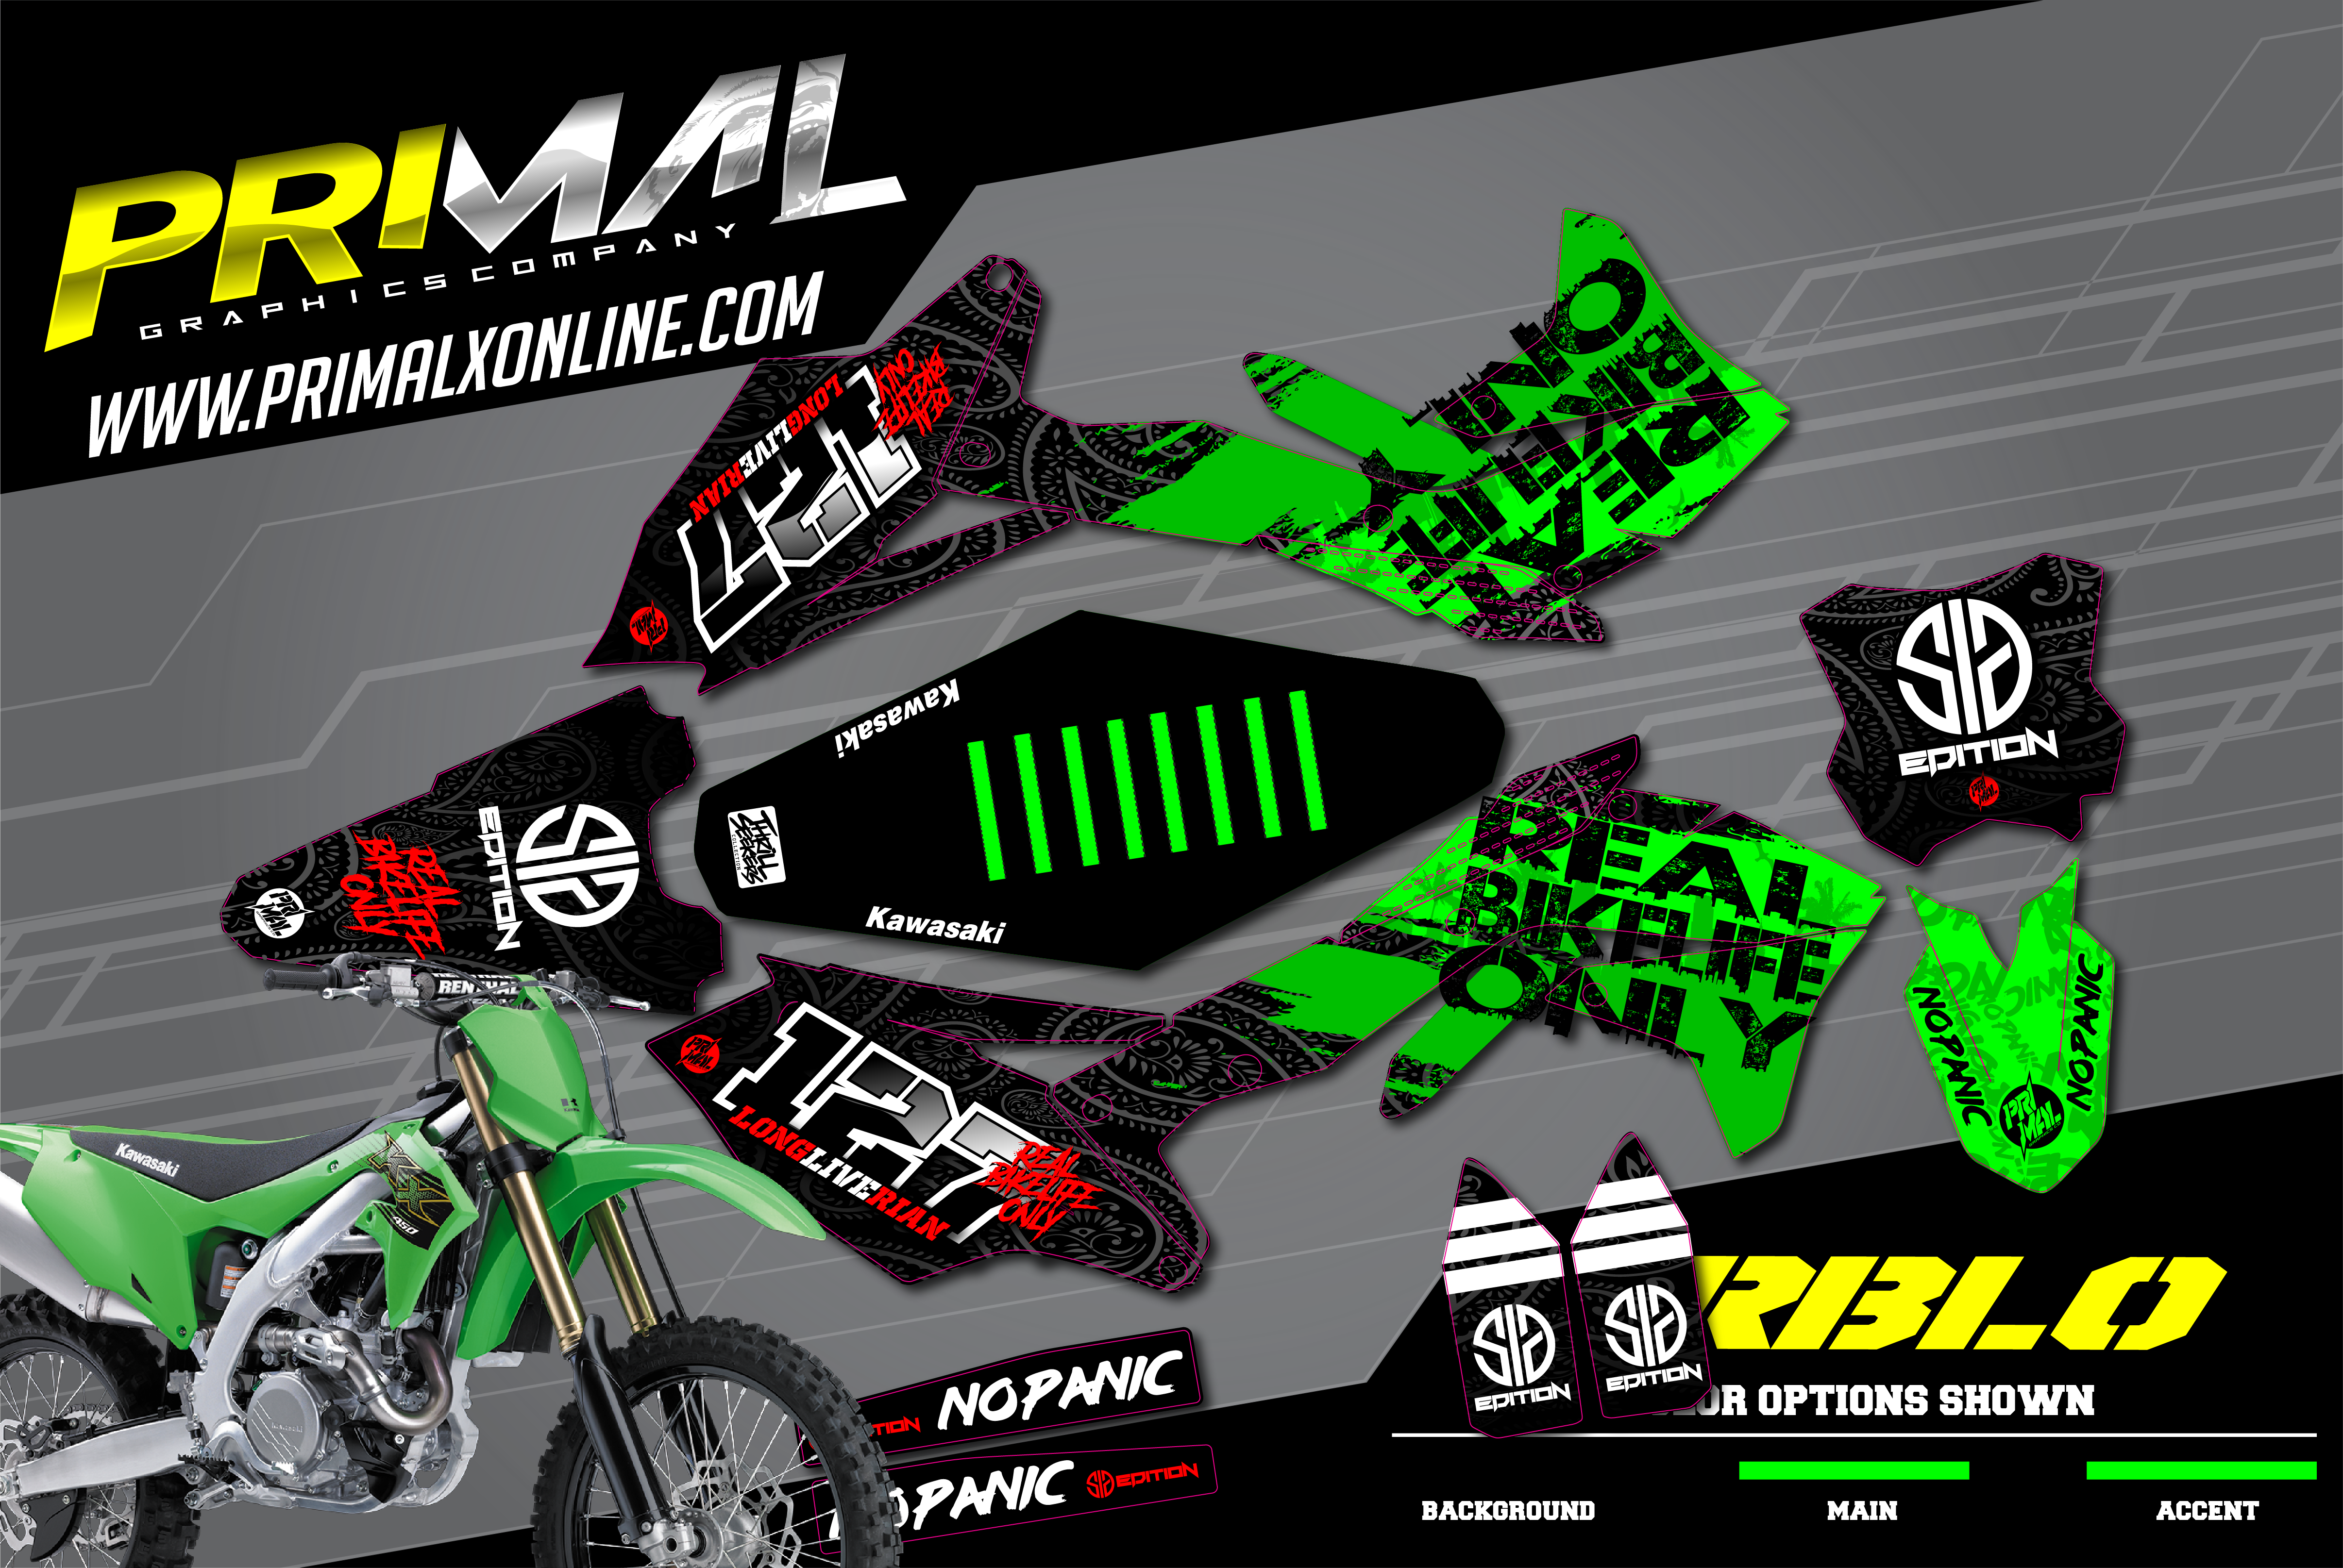 PRIMAL-X-MOTORSPORTS-PRIMAL-GRAPHICS-CO-KAWASAKI-KX250-KX450-SERIES-MOTOCROSS-GRAPHICS-RETRO-PRIMAL-GFX-CO-MX-GRAPHICS-MX-DECALS-REAL-BIKELIFE-ONLY-01